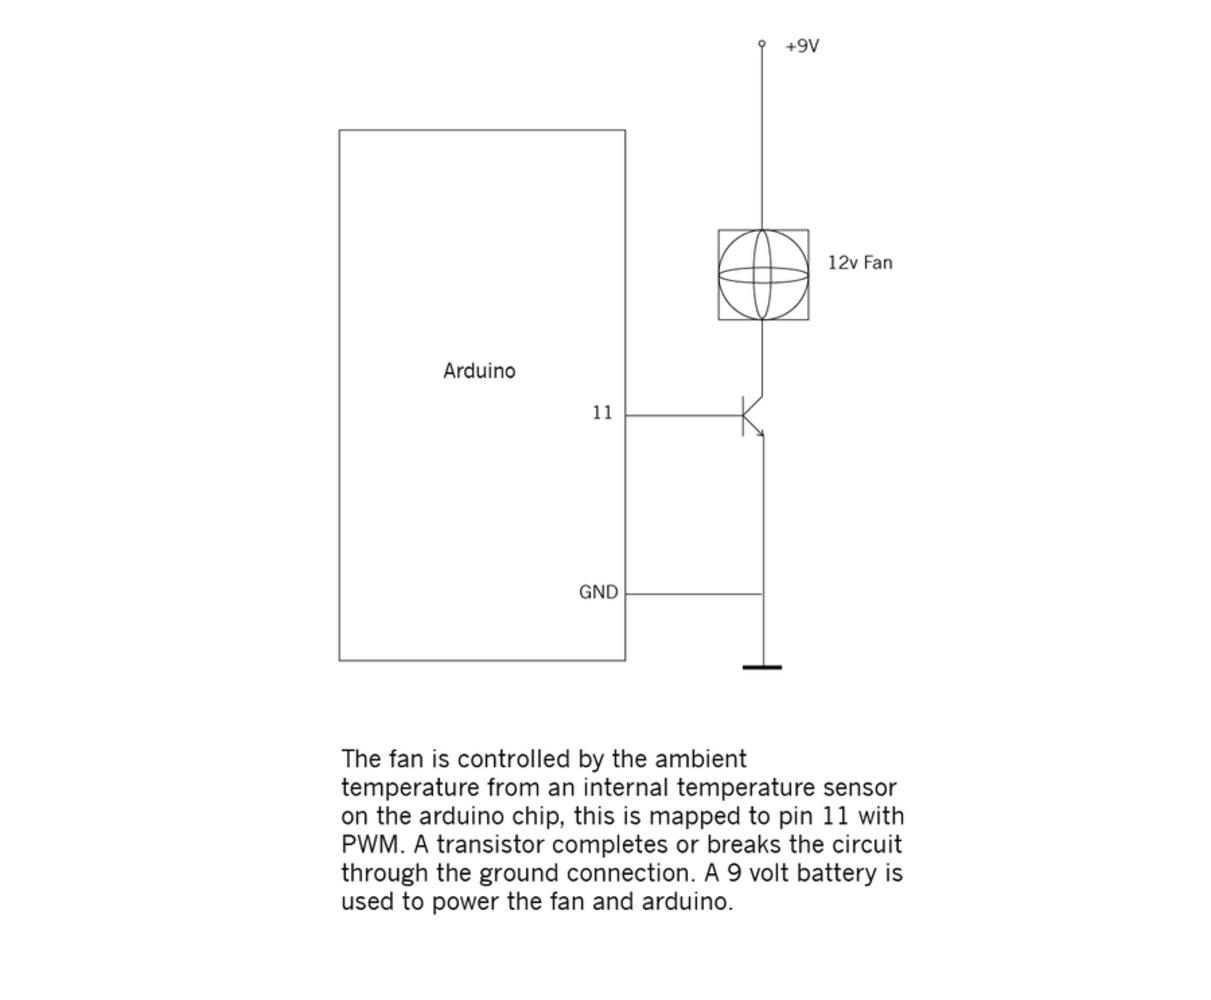 Wiring diagram 01.thumb